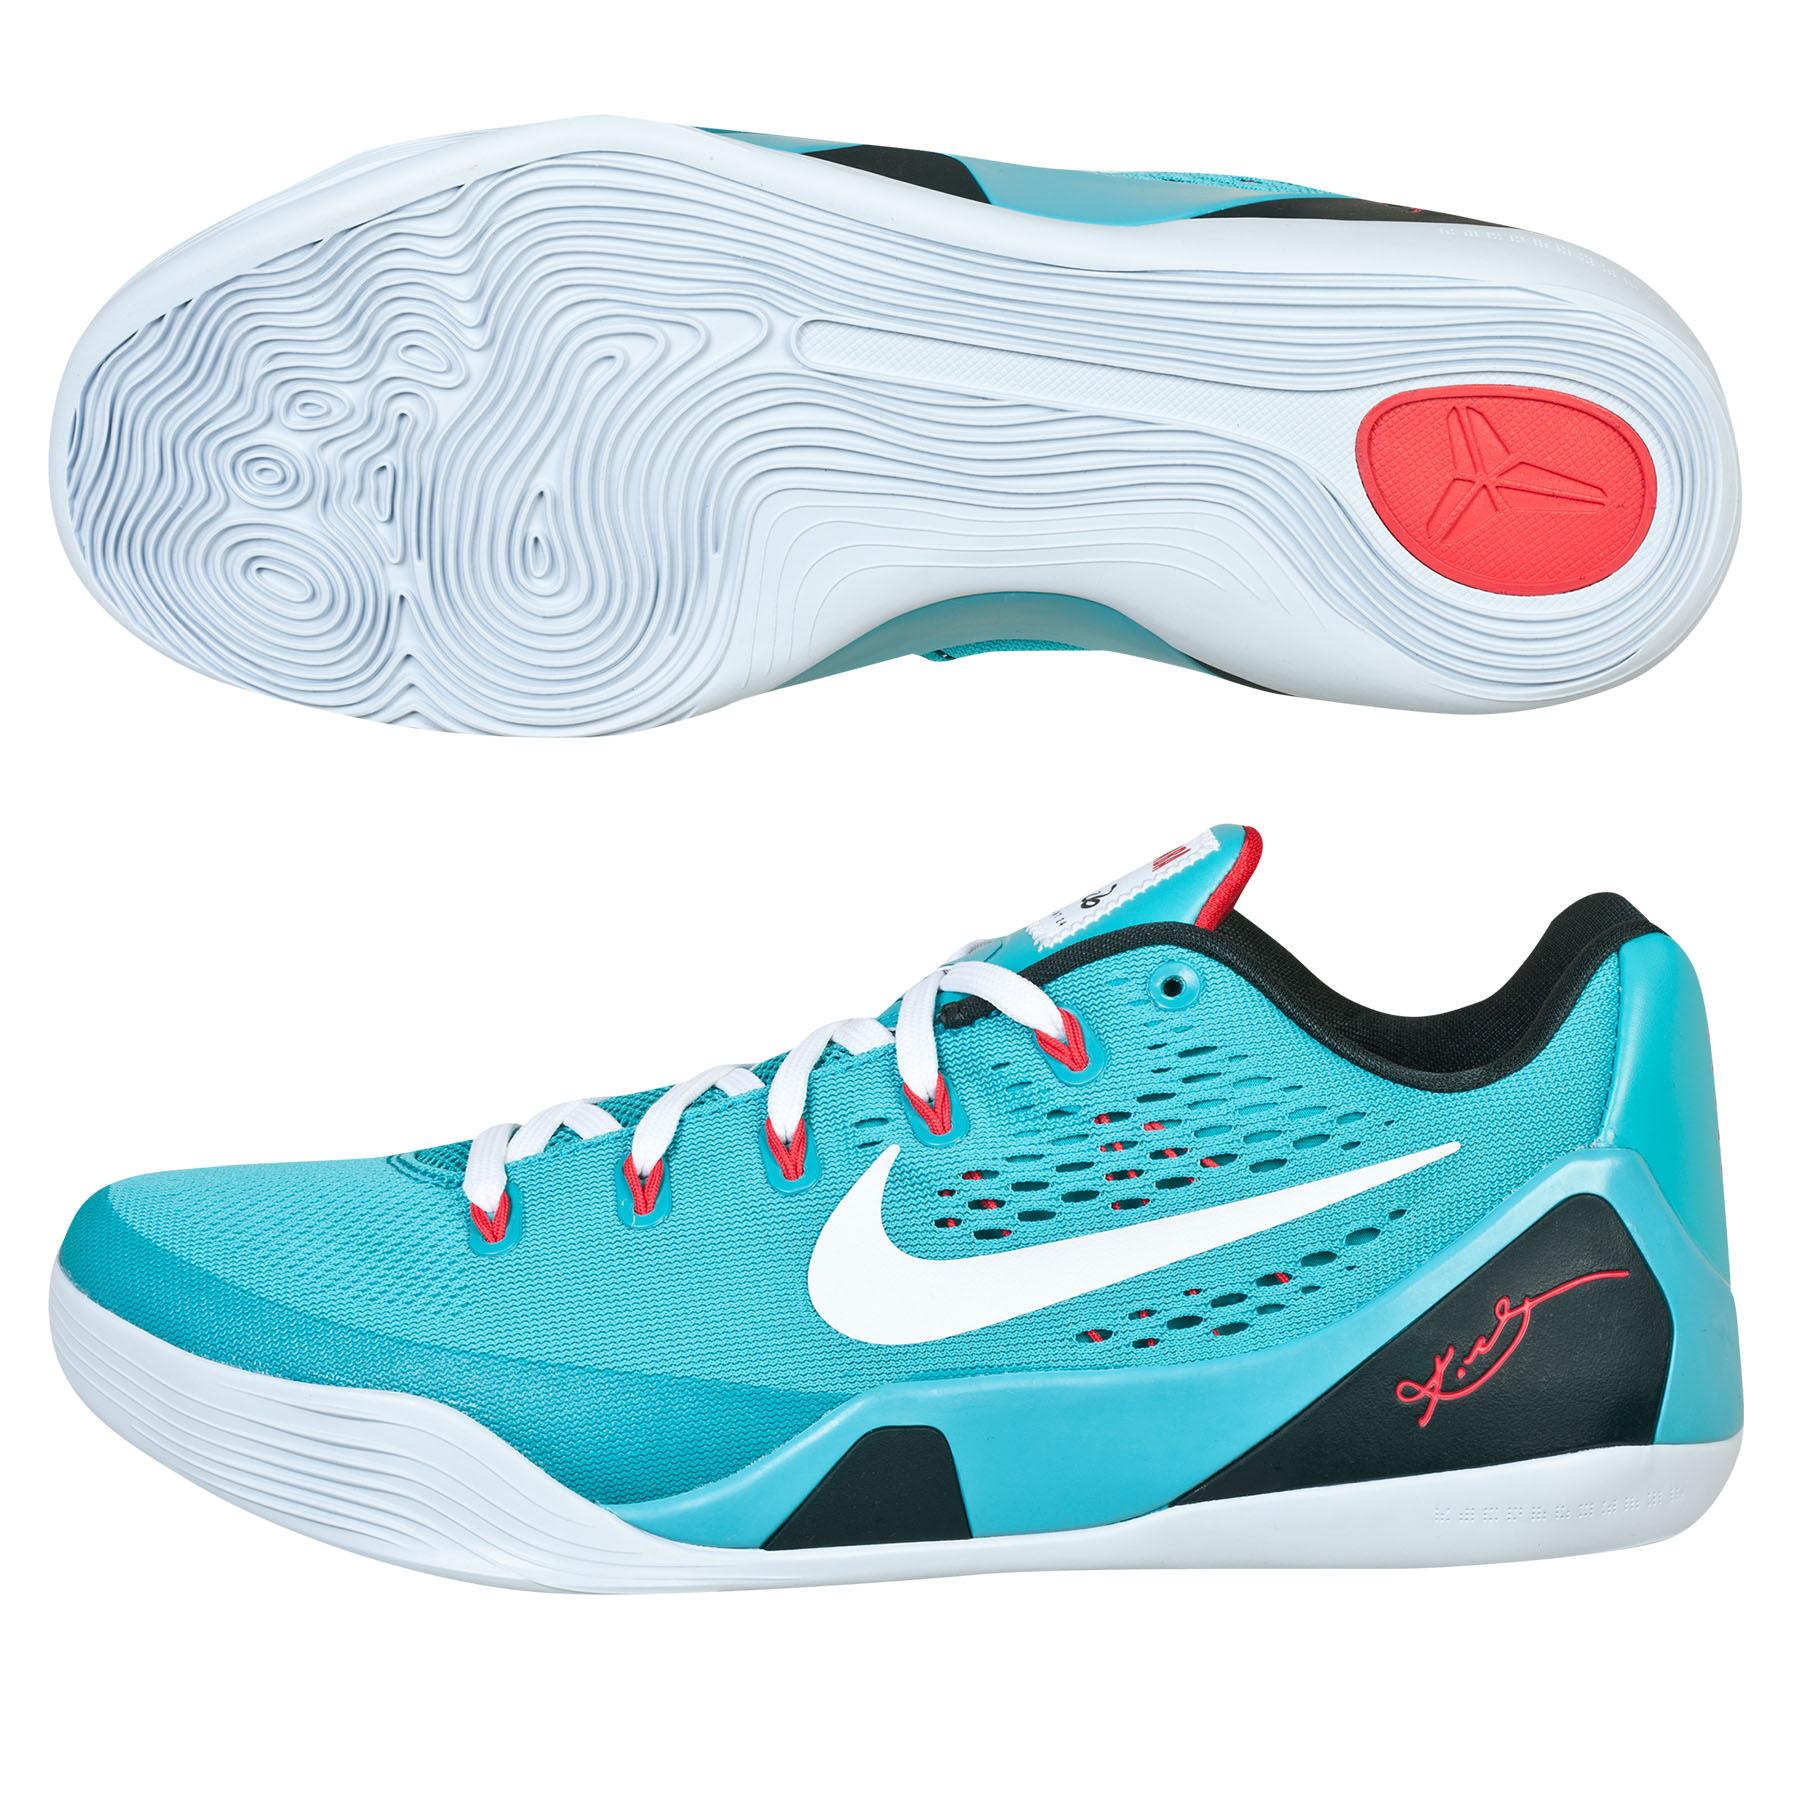 Nike Kobe IX EM Basketball Shoe - EM